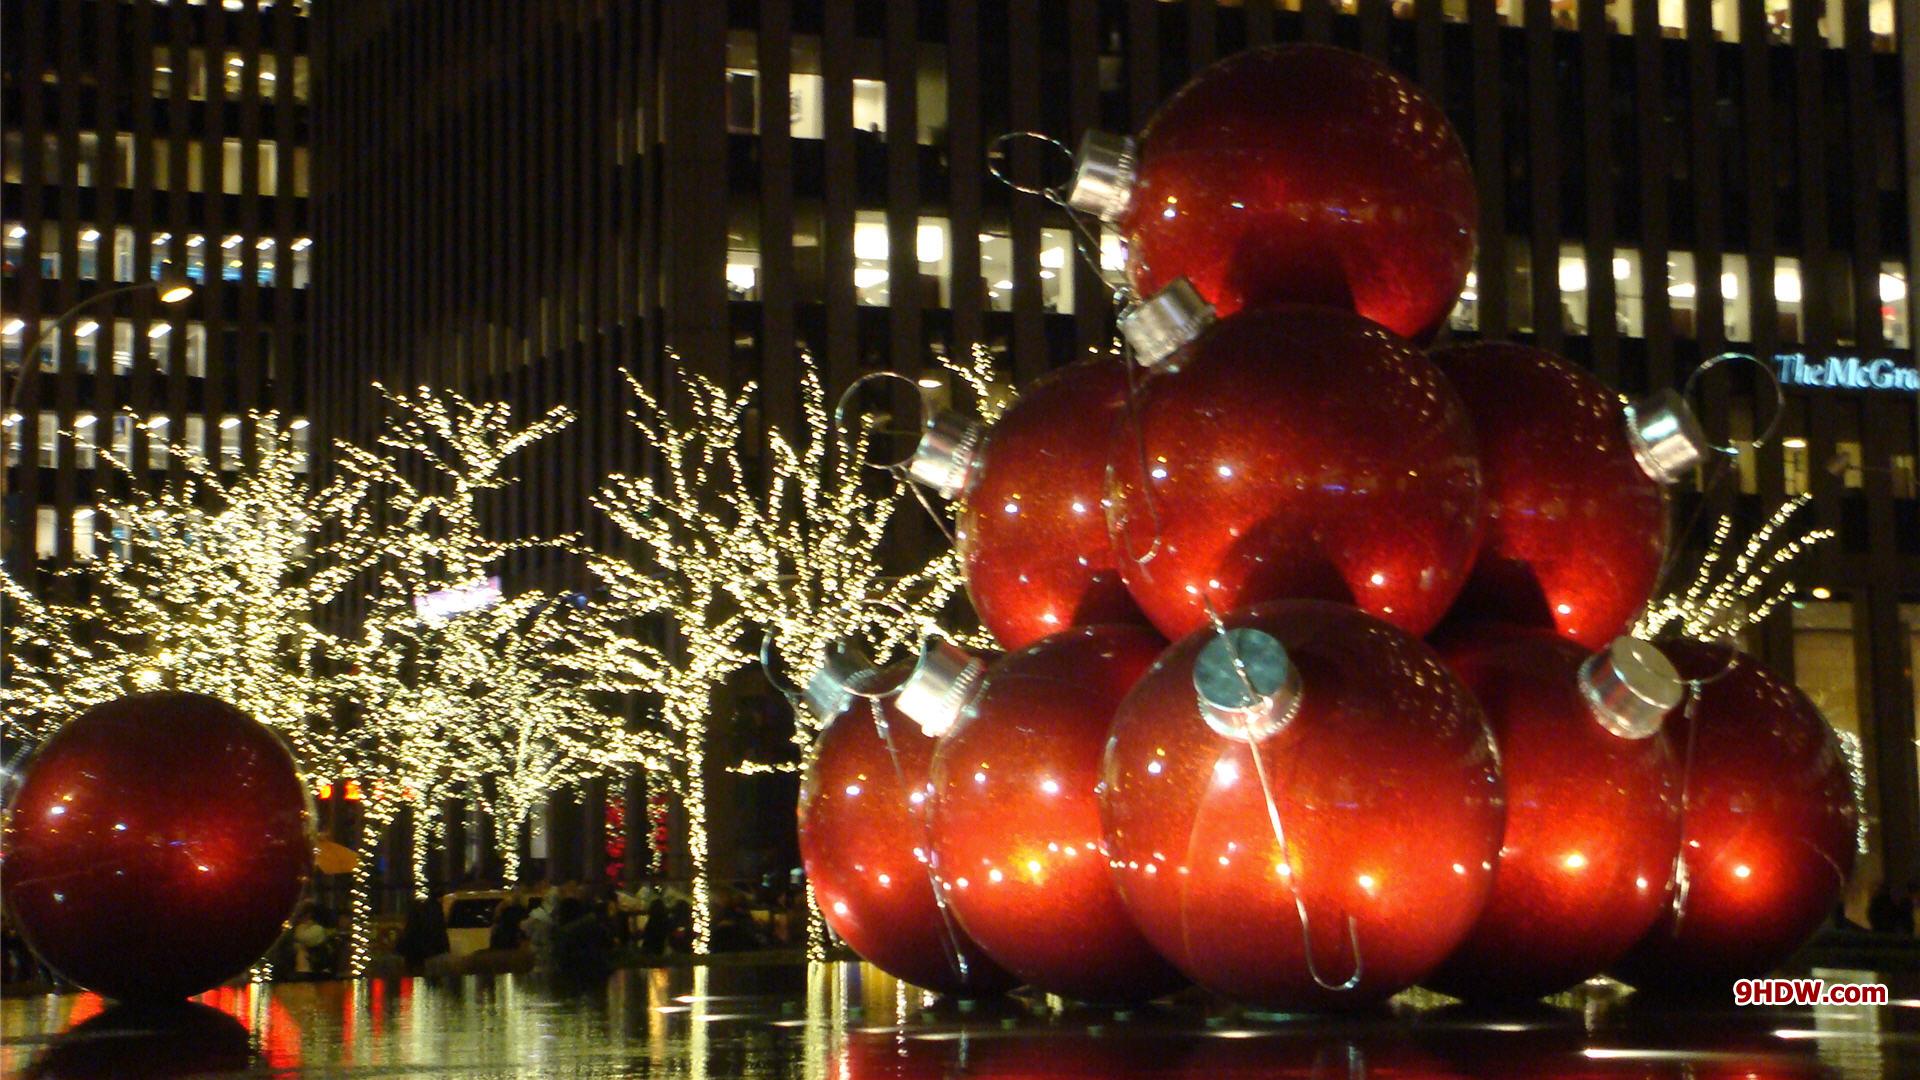 New York Christmas Desktop Wallpaper HD 1920x1080 2143 1920x1080